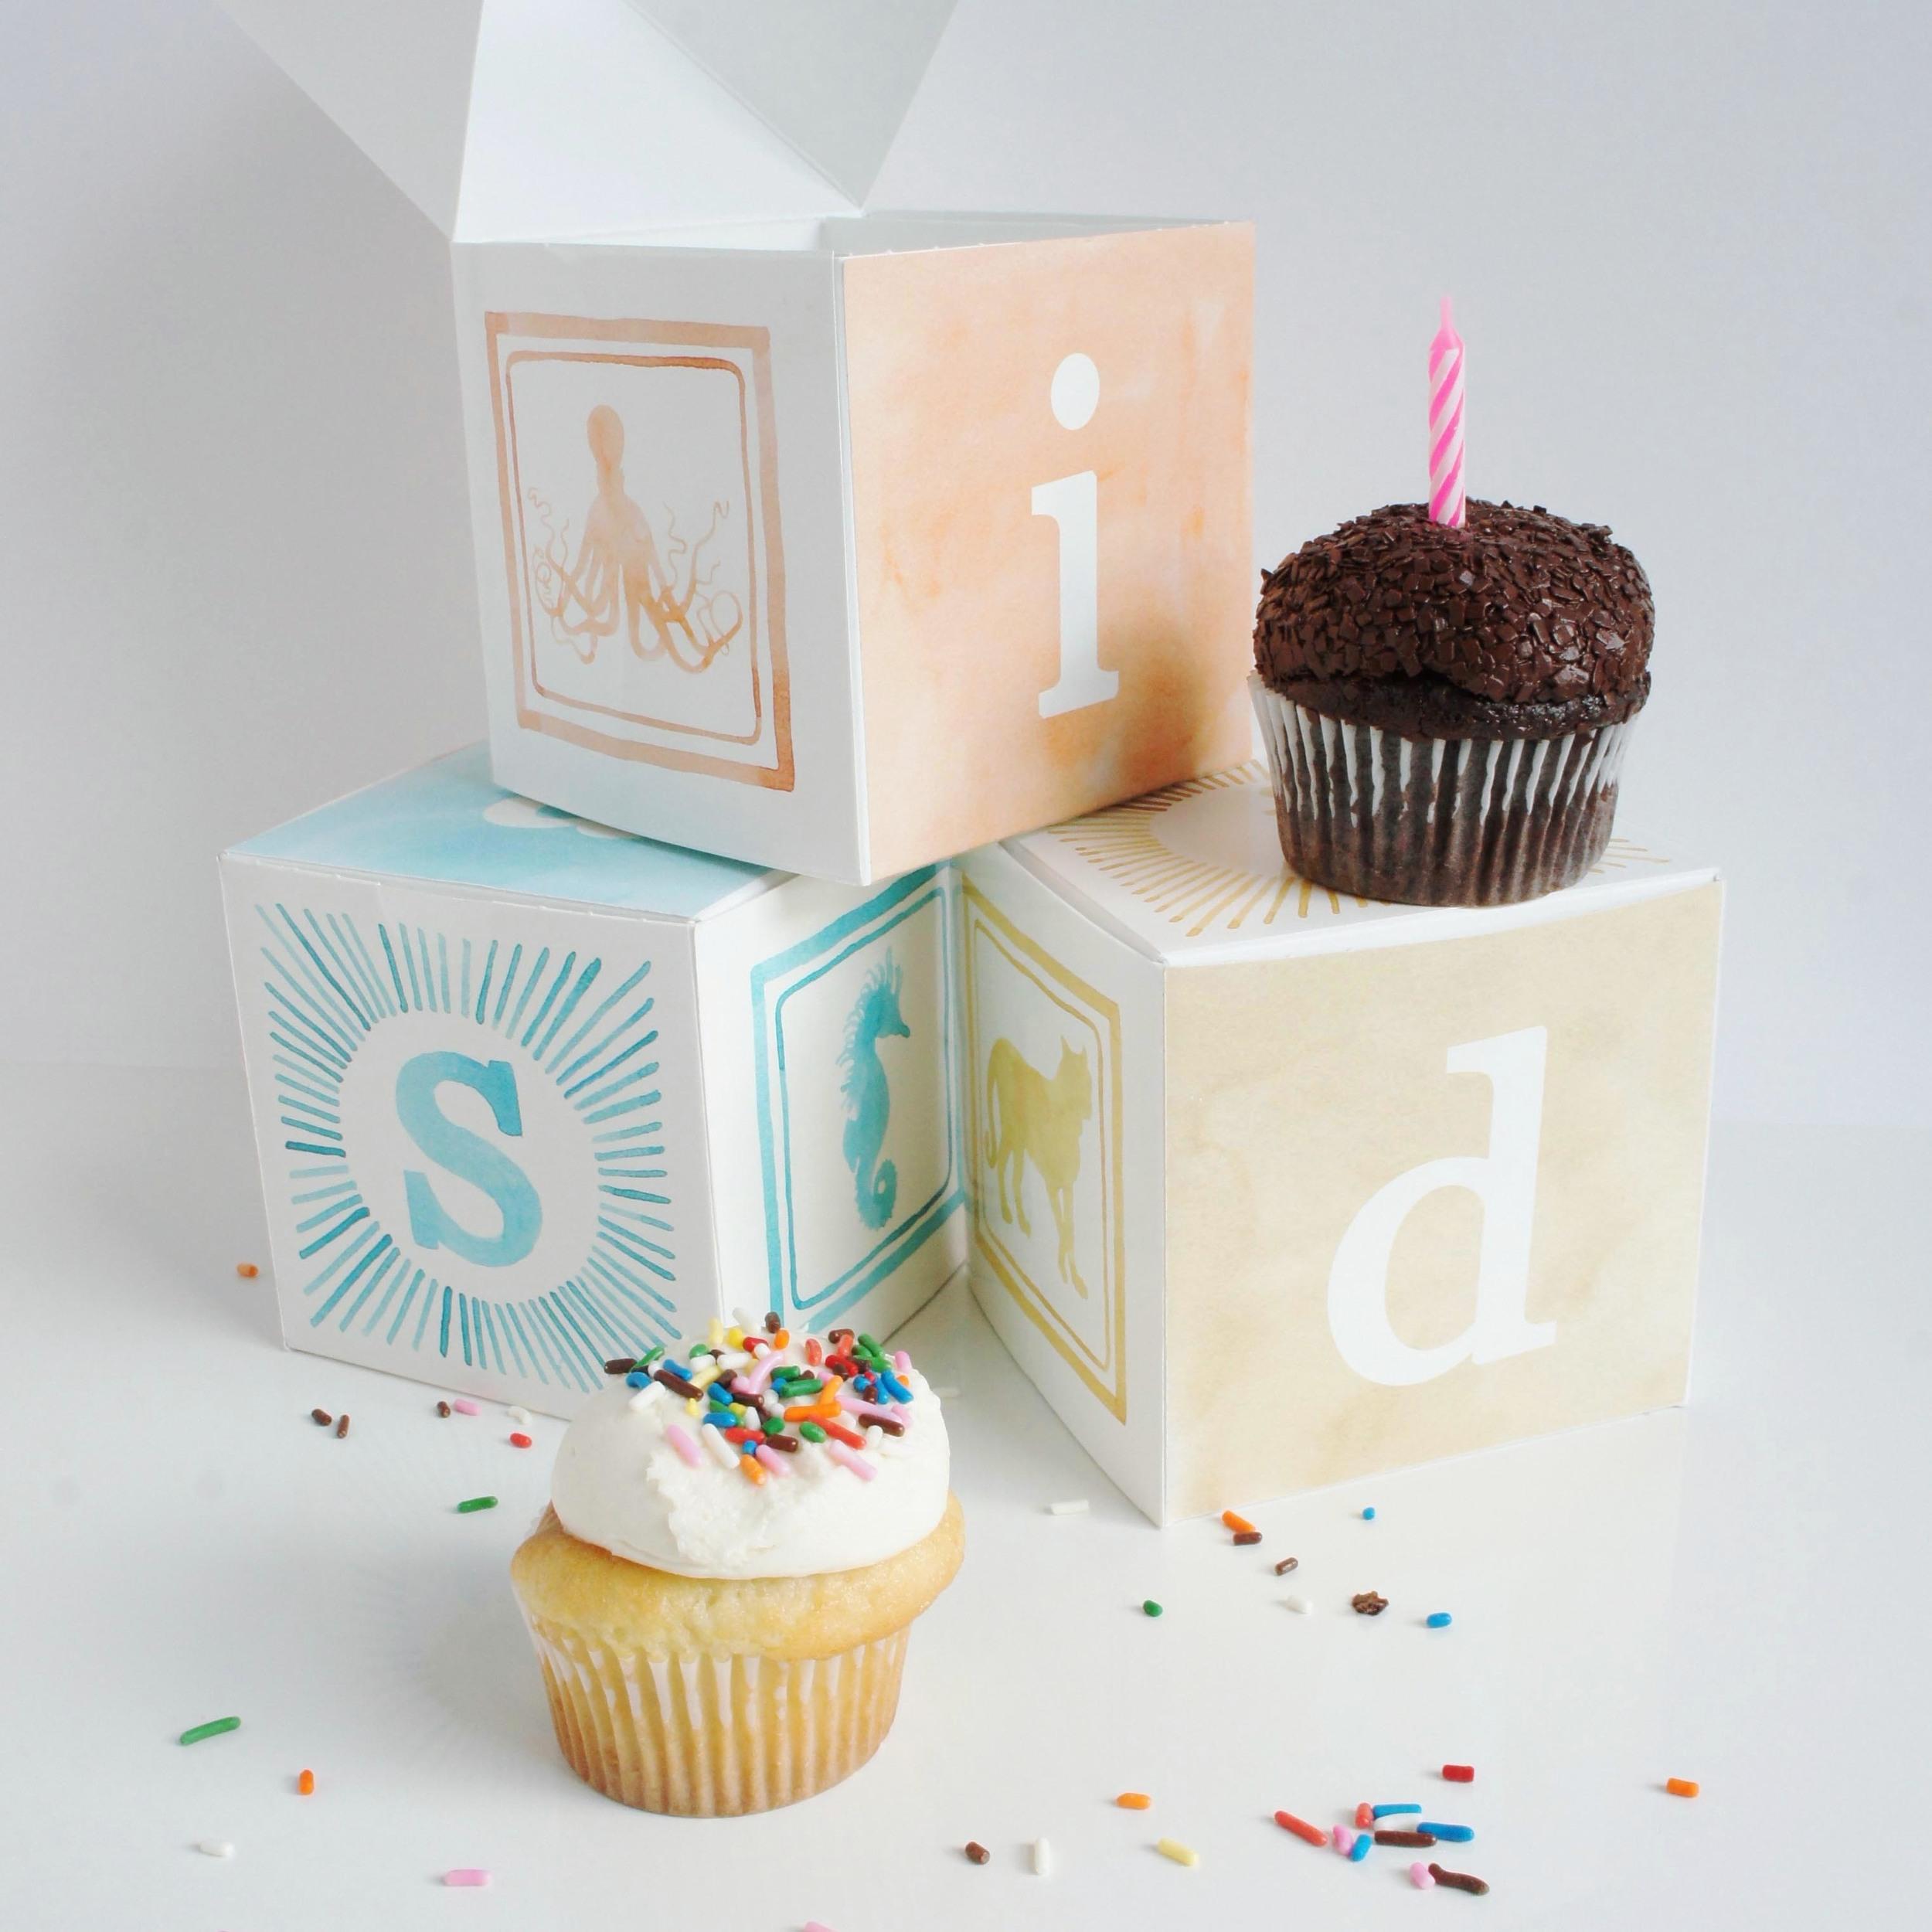 cupcake detail 1 copy.jpg